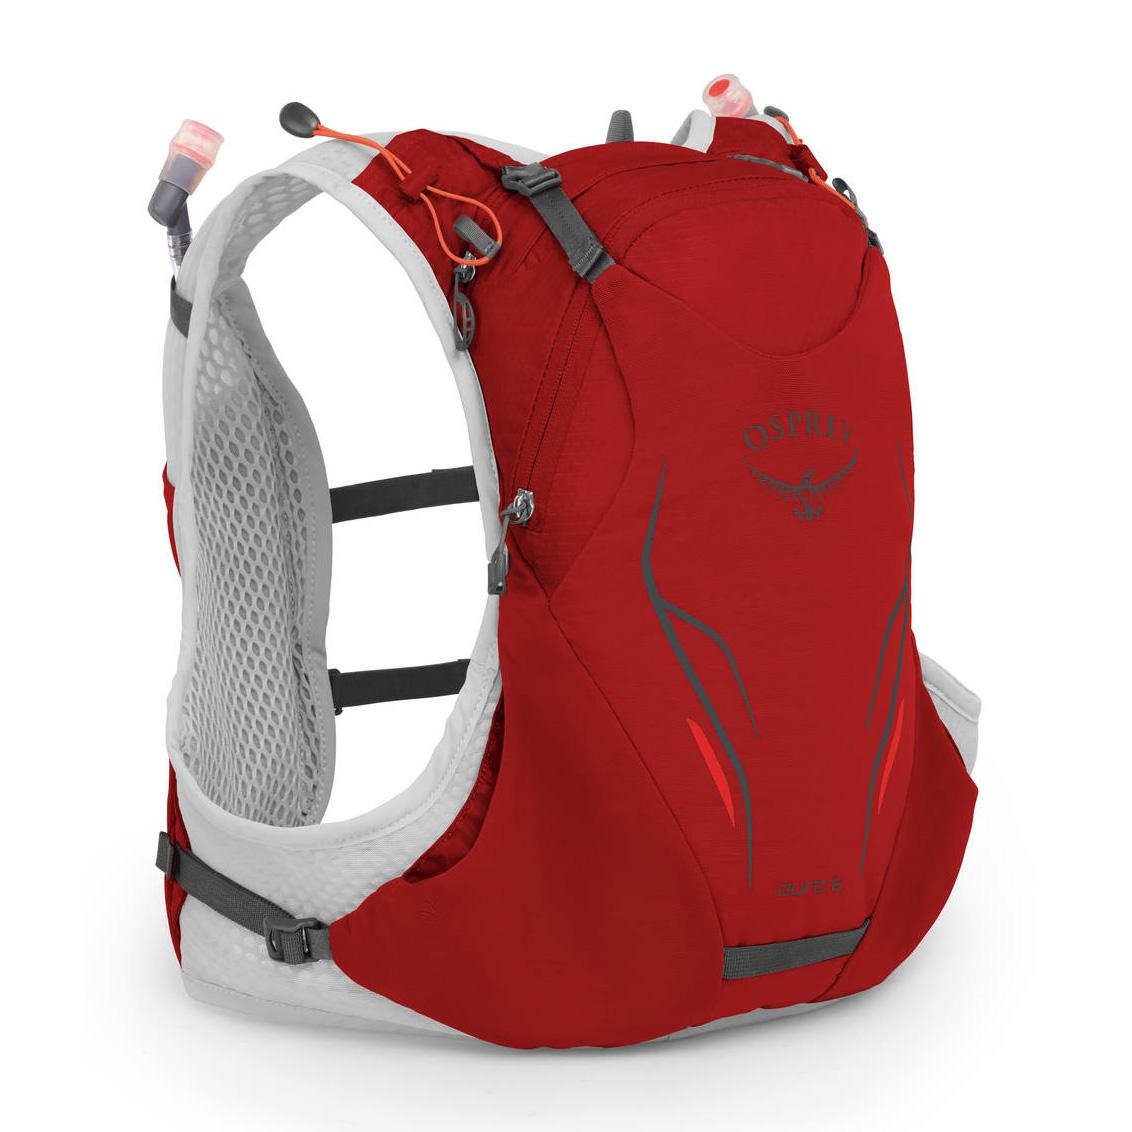 Osprey Duro 6 Running Backpack - Phoenix Red